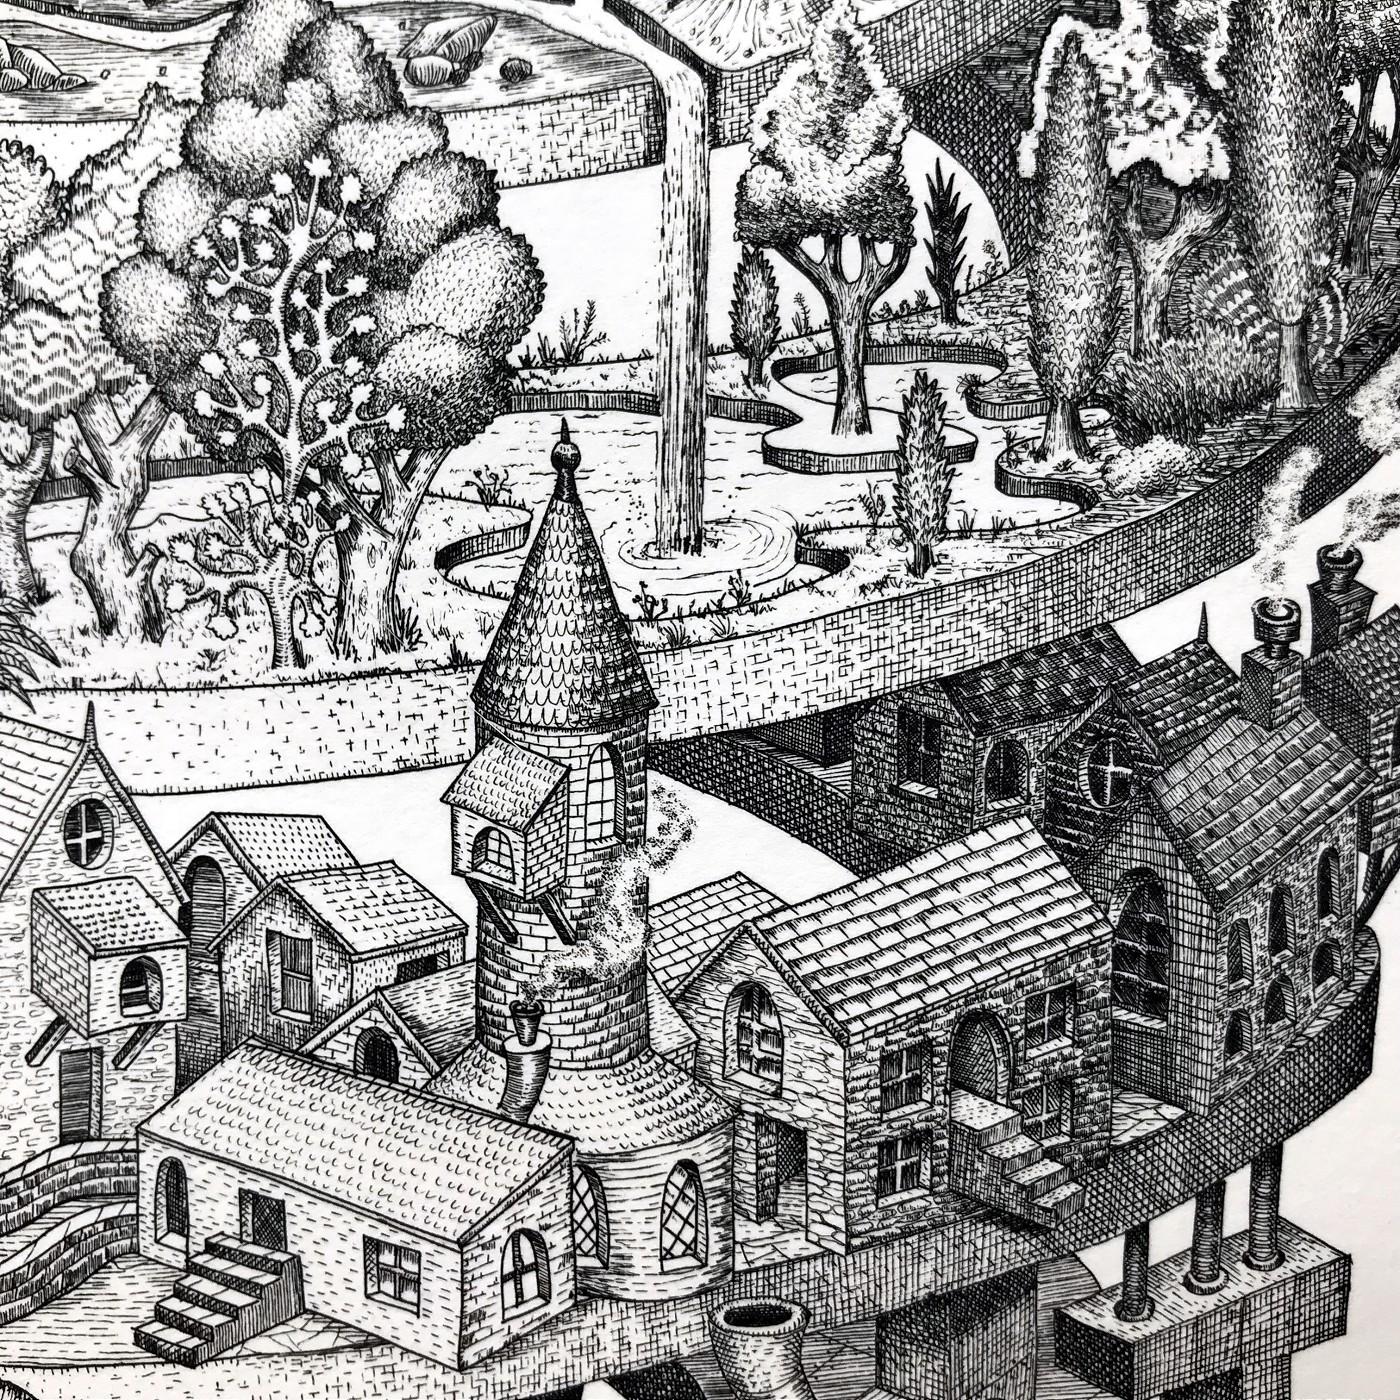 Phlegm etchings